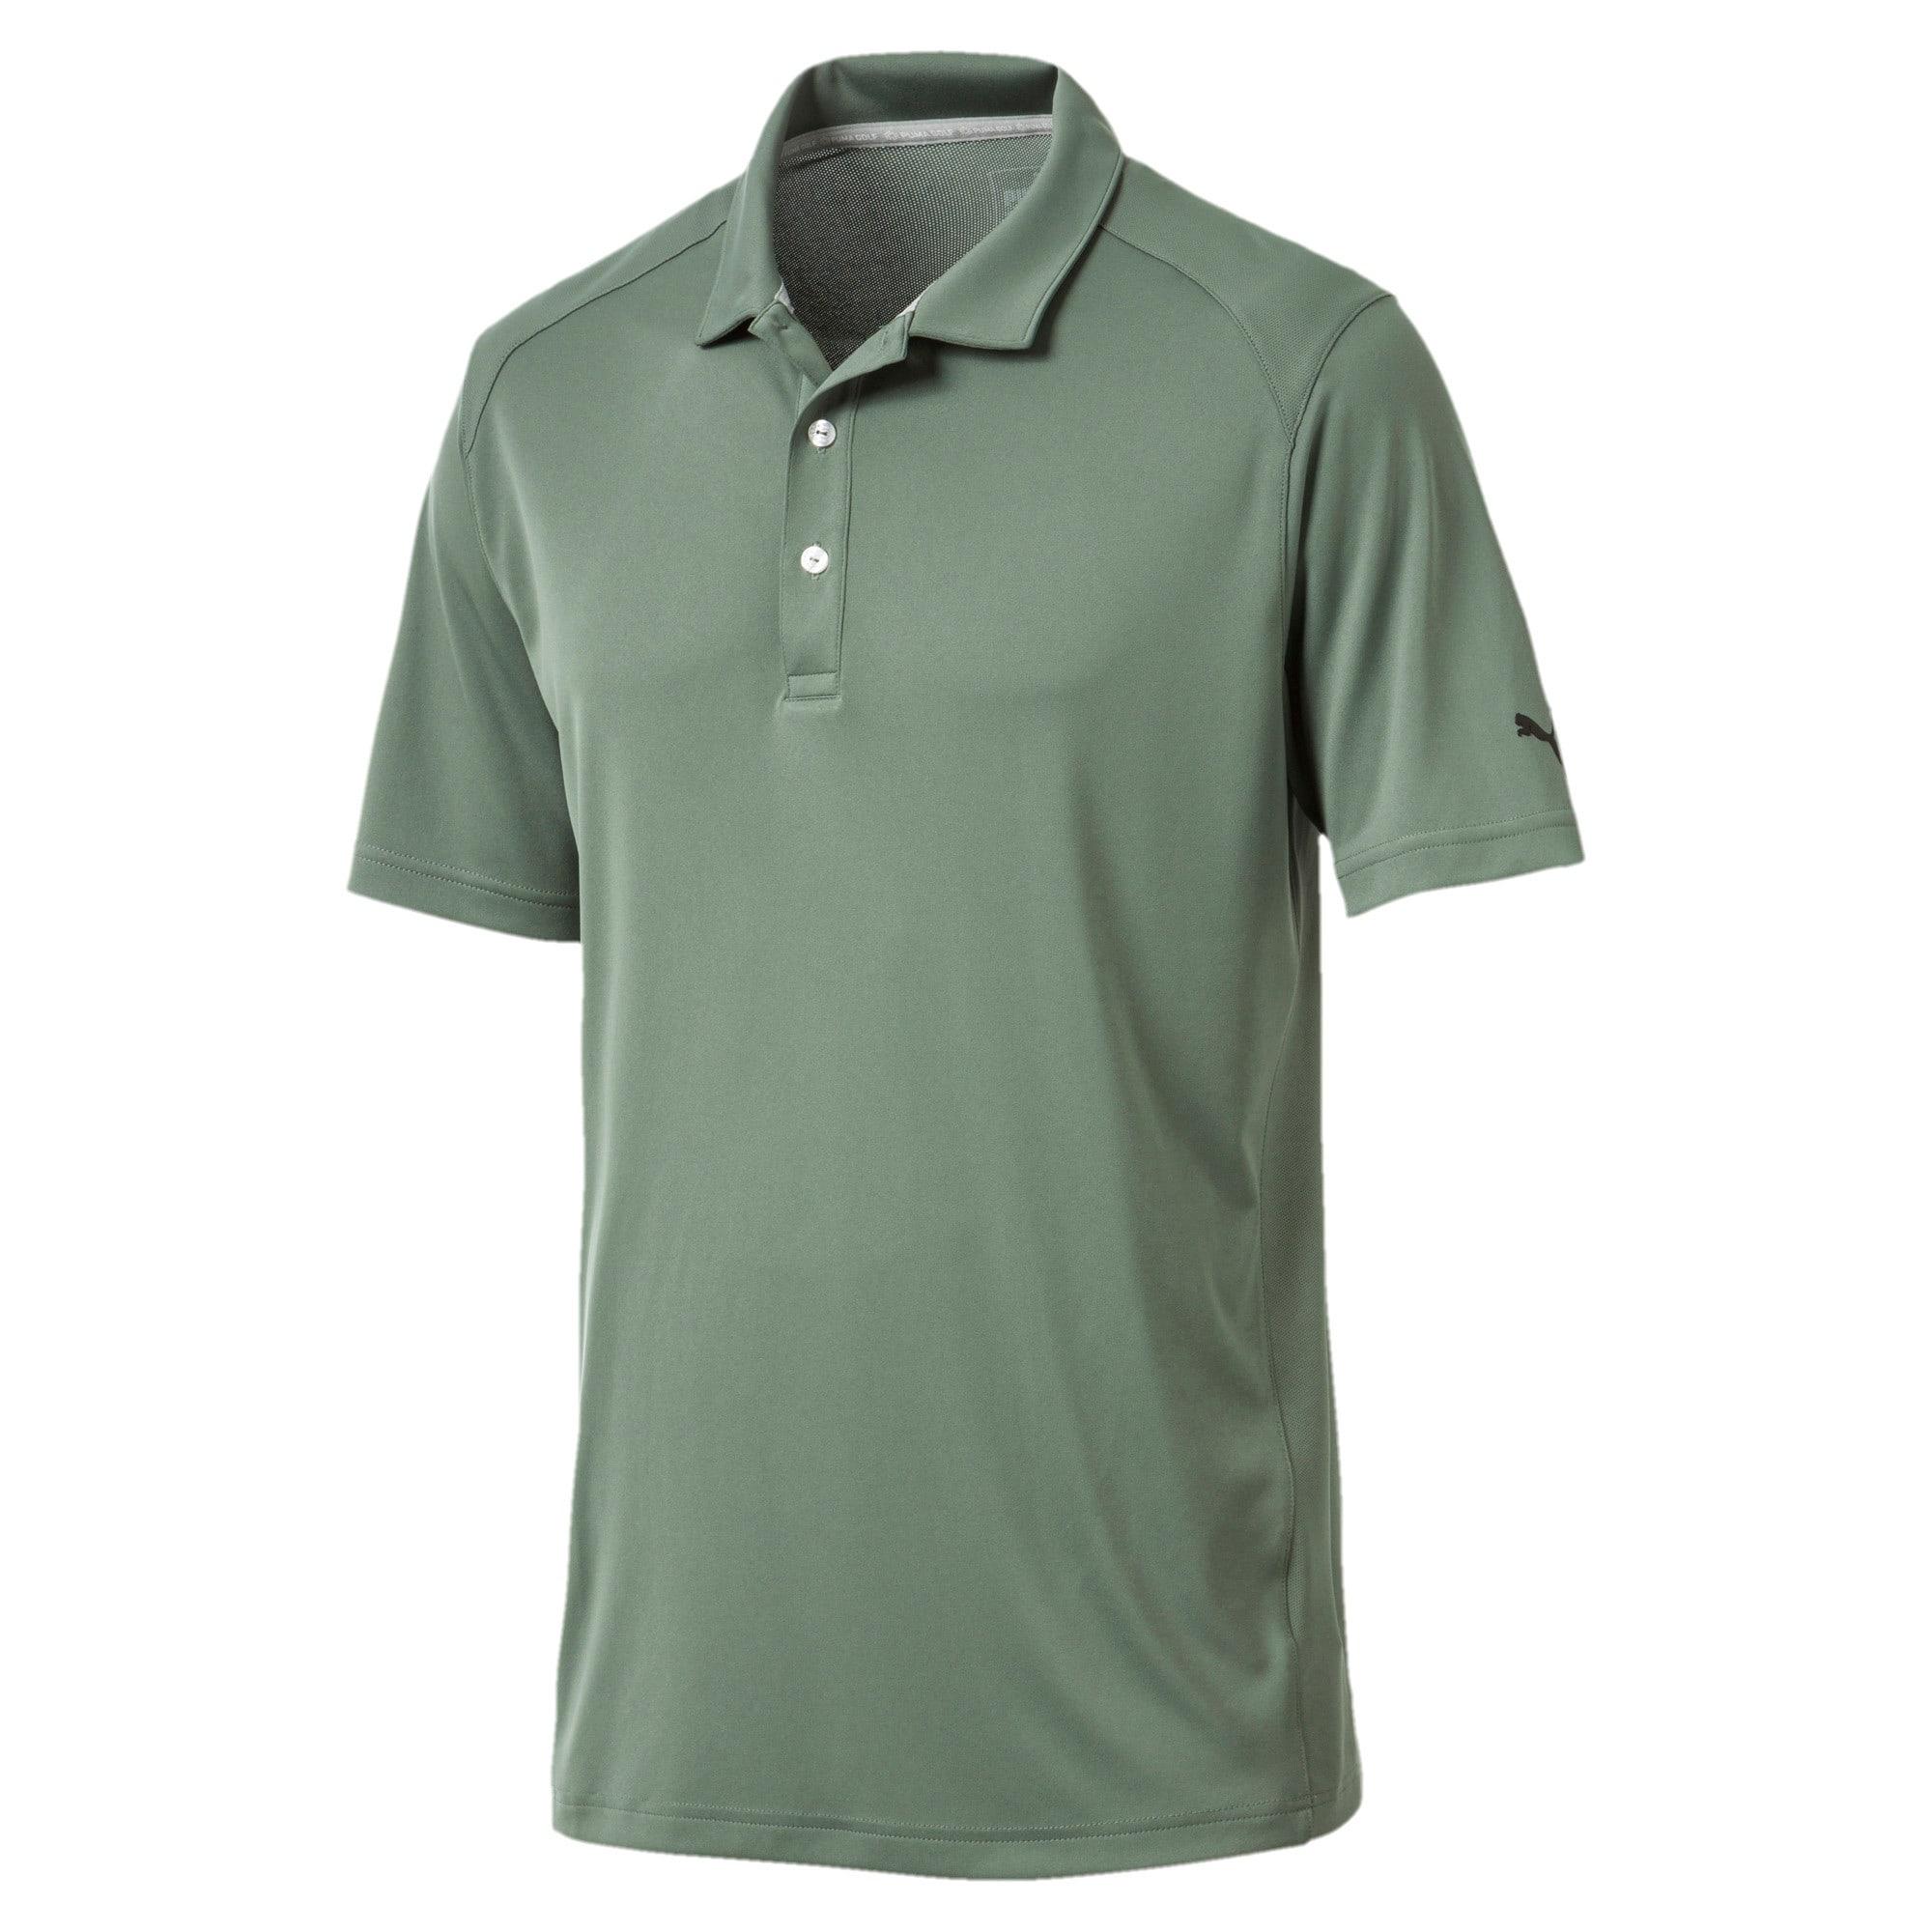 Thumbnail 1 of Essential Pounce Polo Shirt, Laurel Wreath, medium